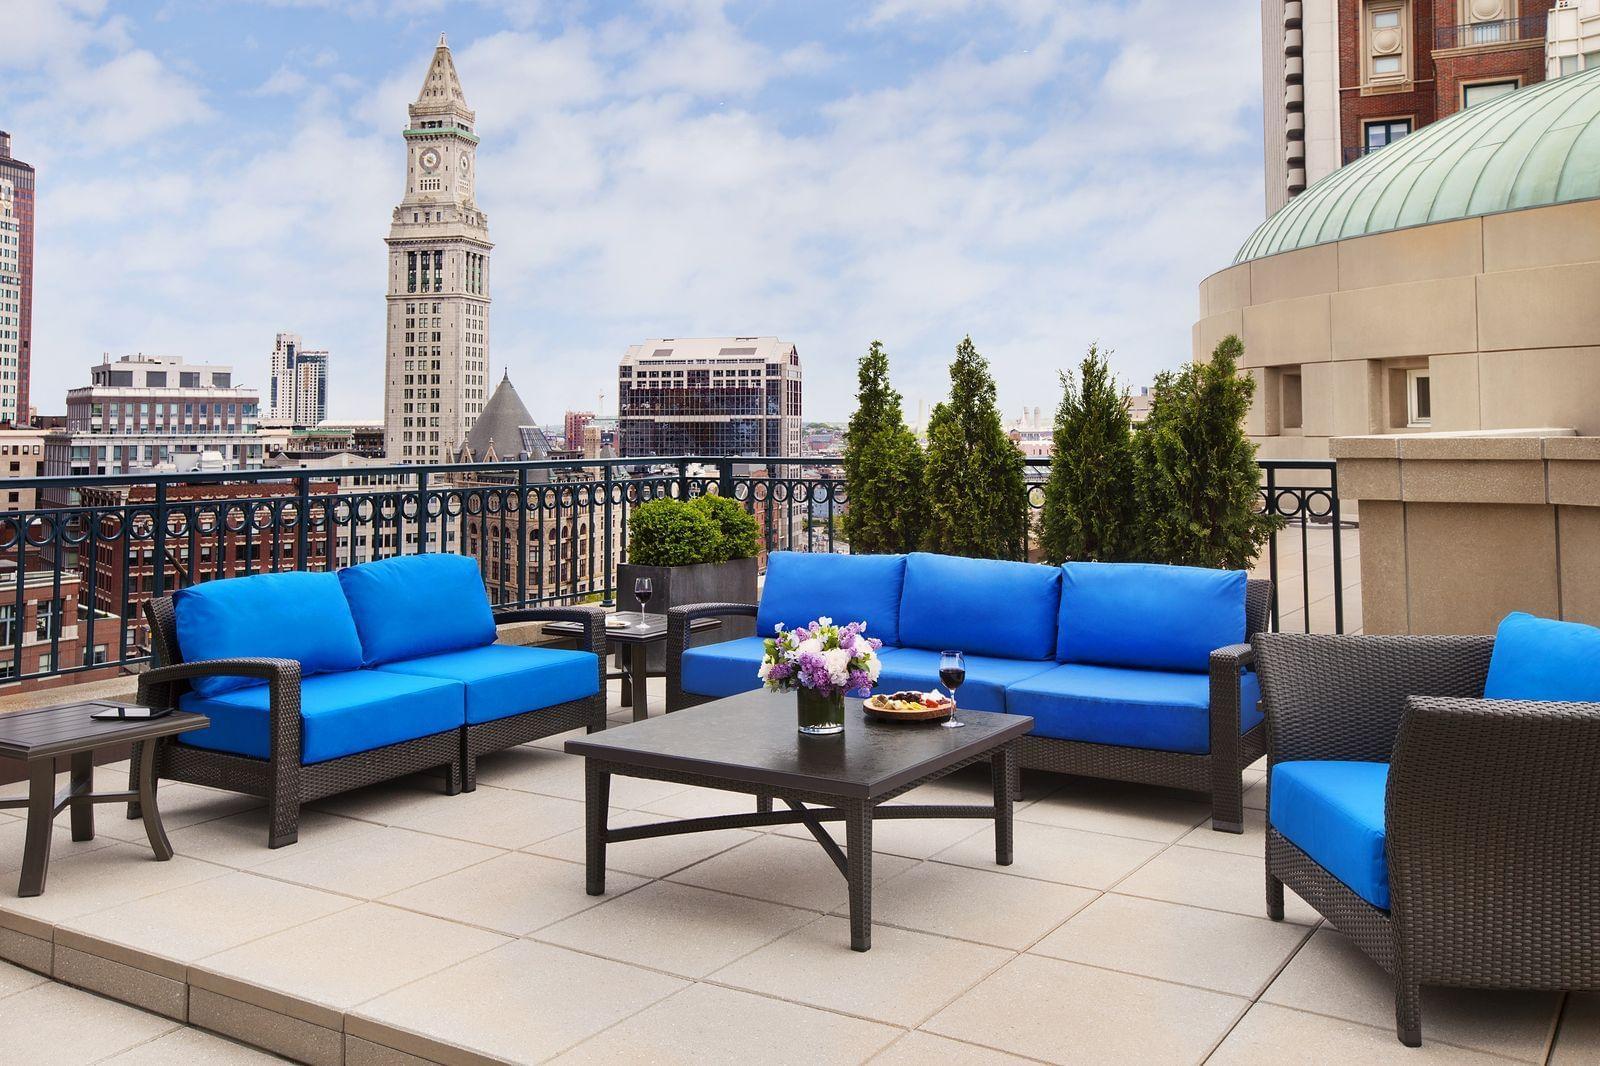 Hotel suite balcony with Boston skyline view